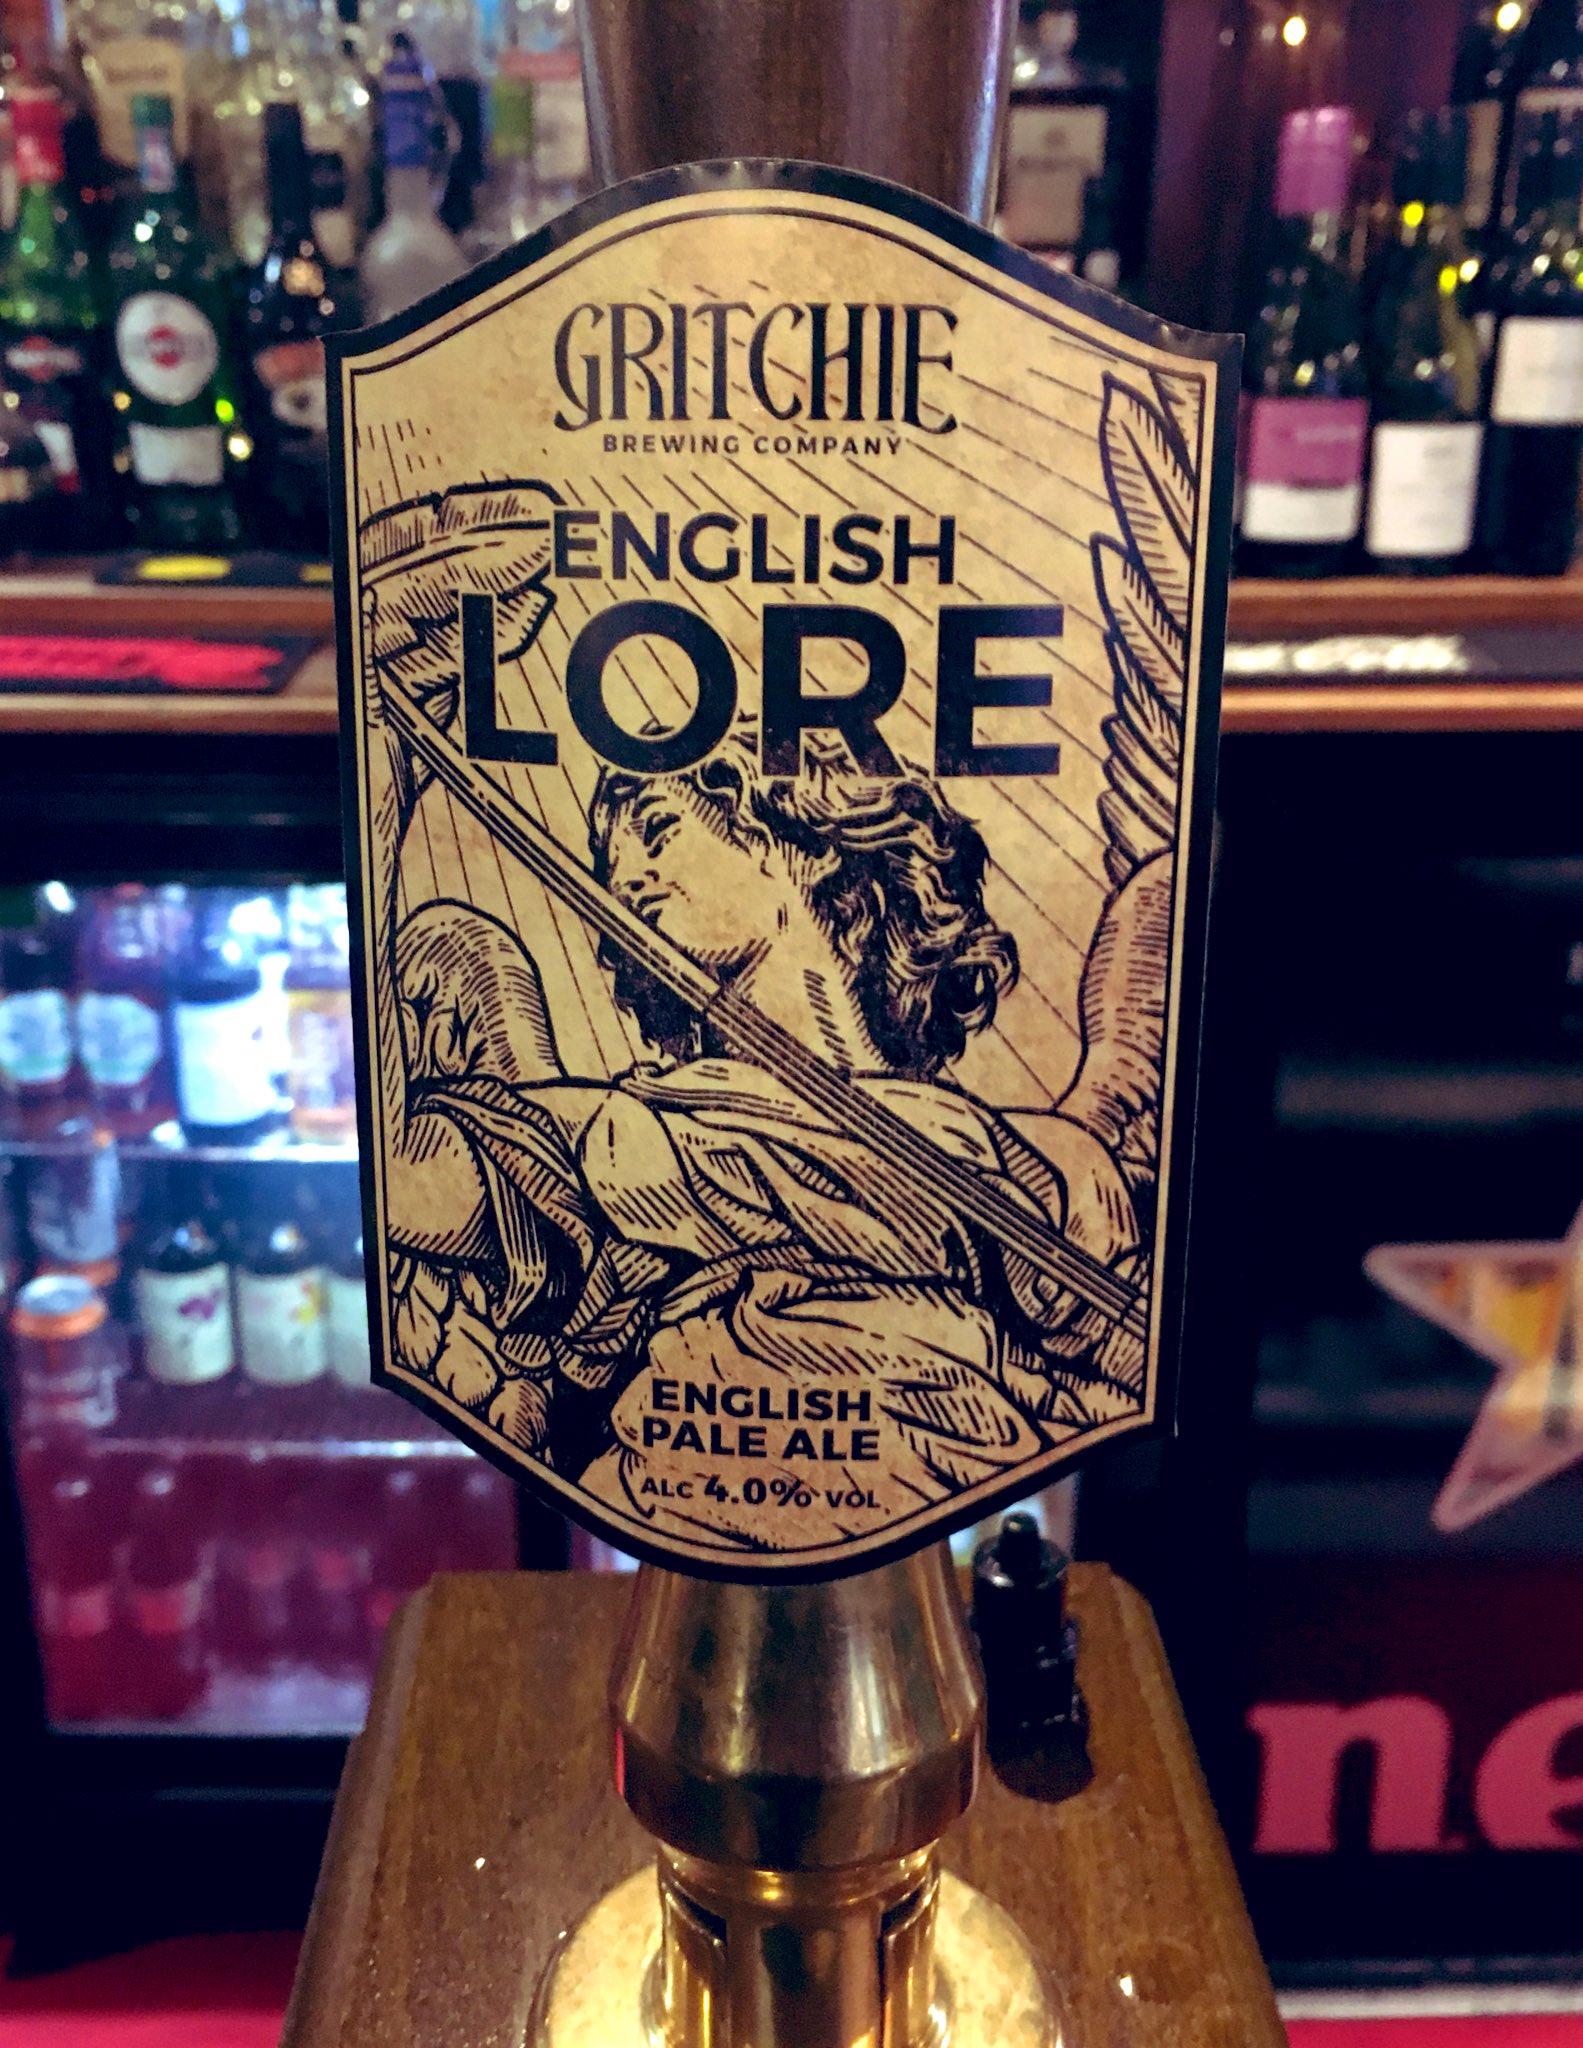 177: English Lore